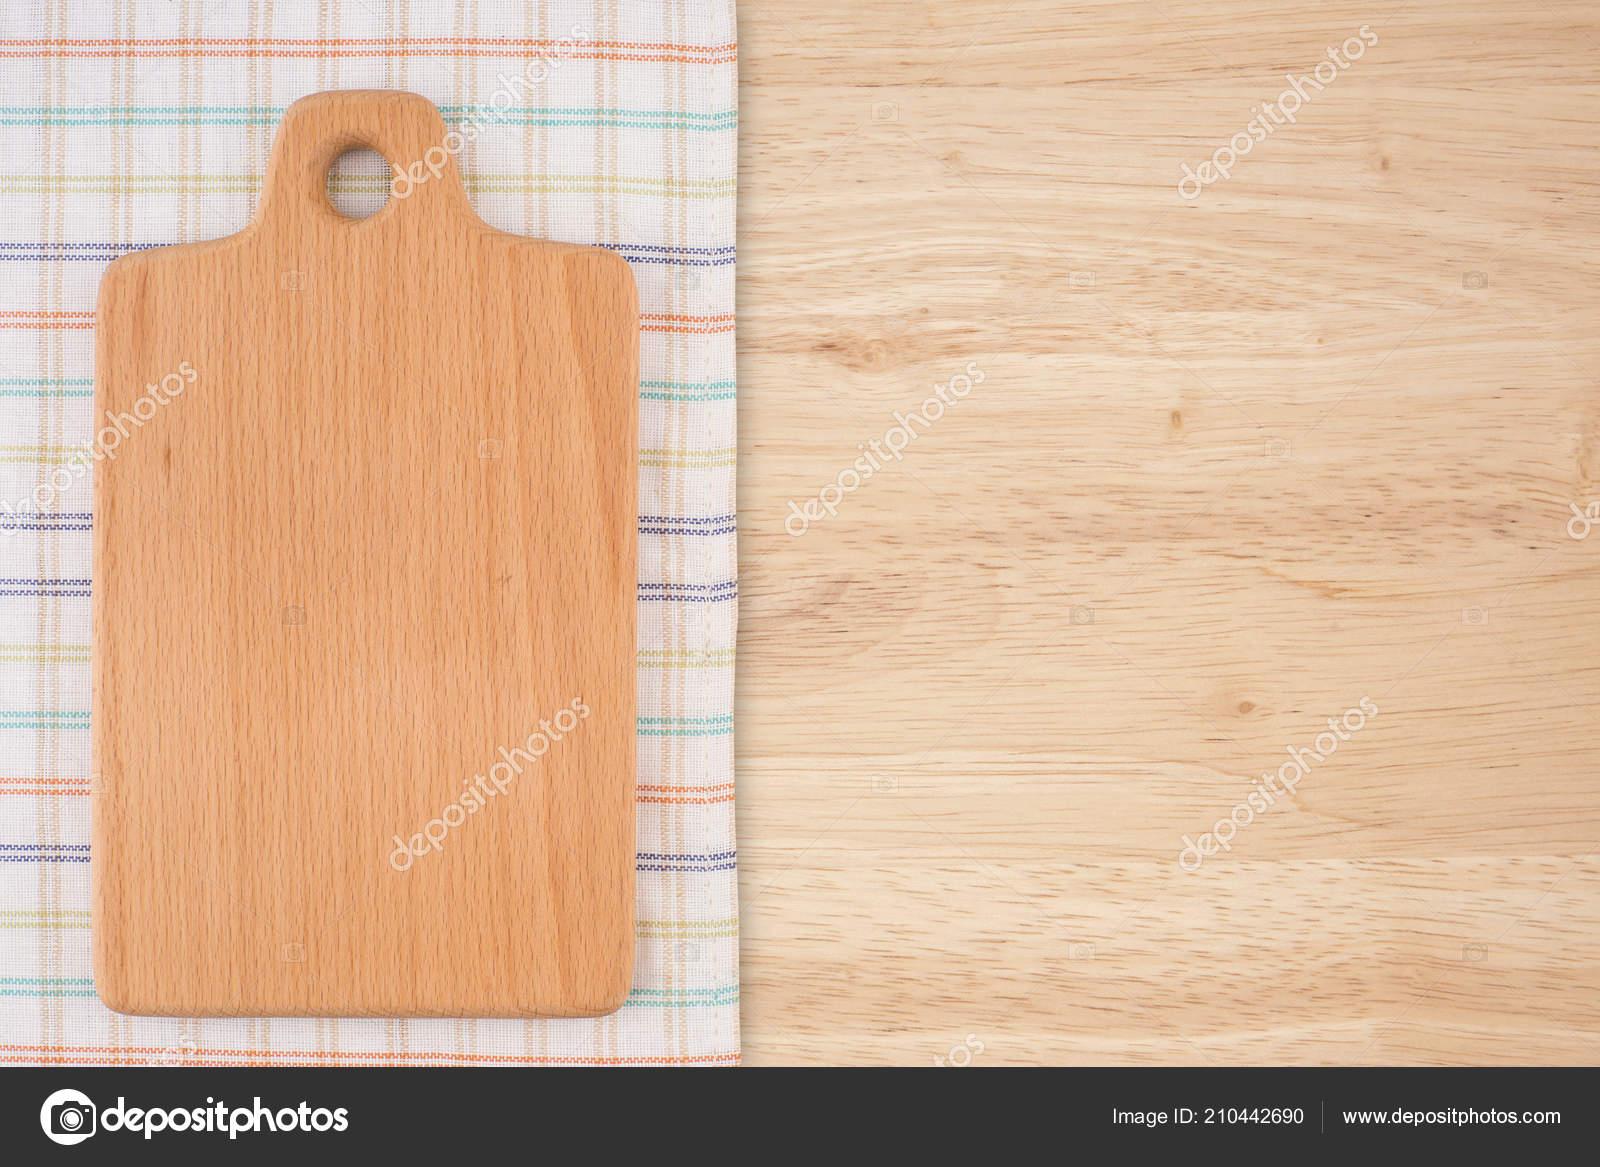 kitchen napkins sinks okc 菜板厨房餐巾放在旧木桌顶视图 图库照片 c dgolbay 210442690